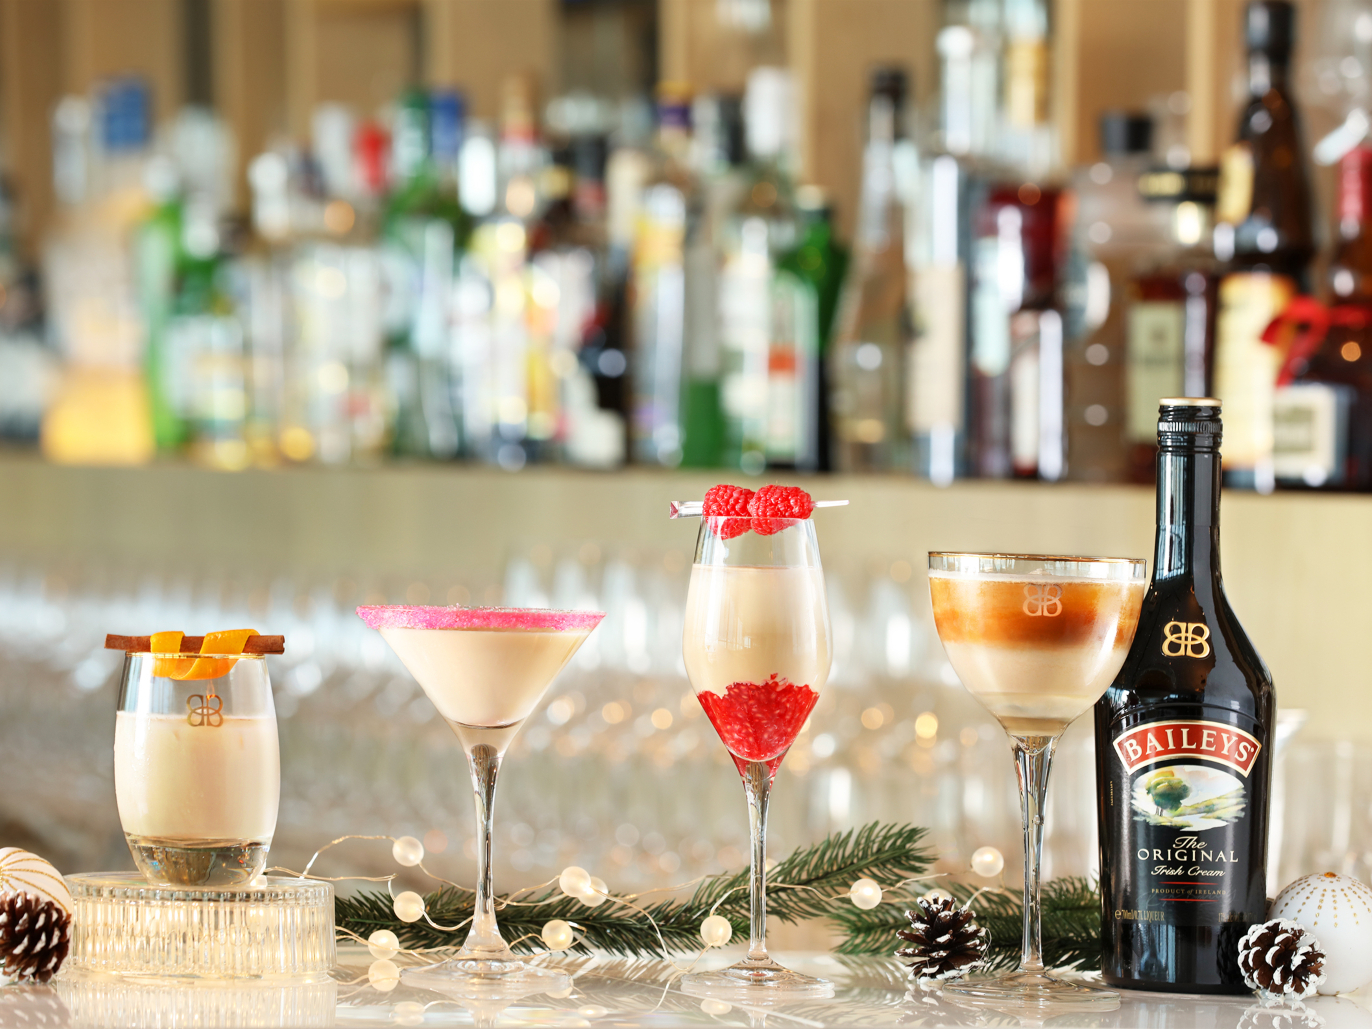 Baileys Christmas Cocktails